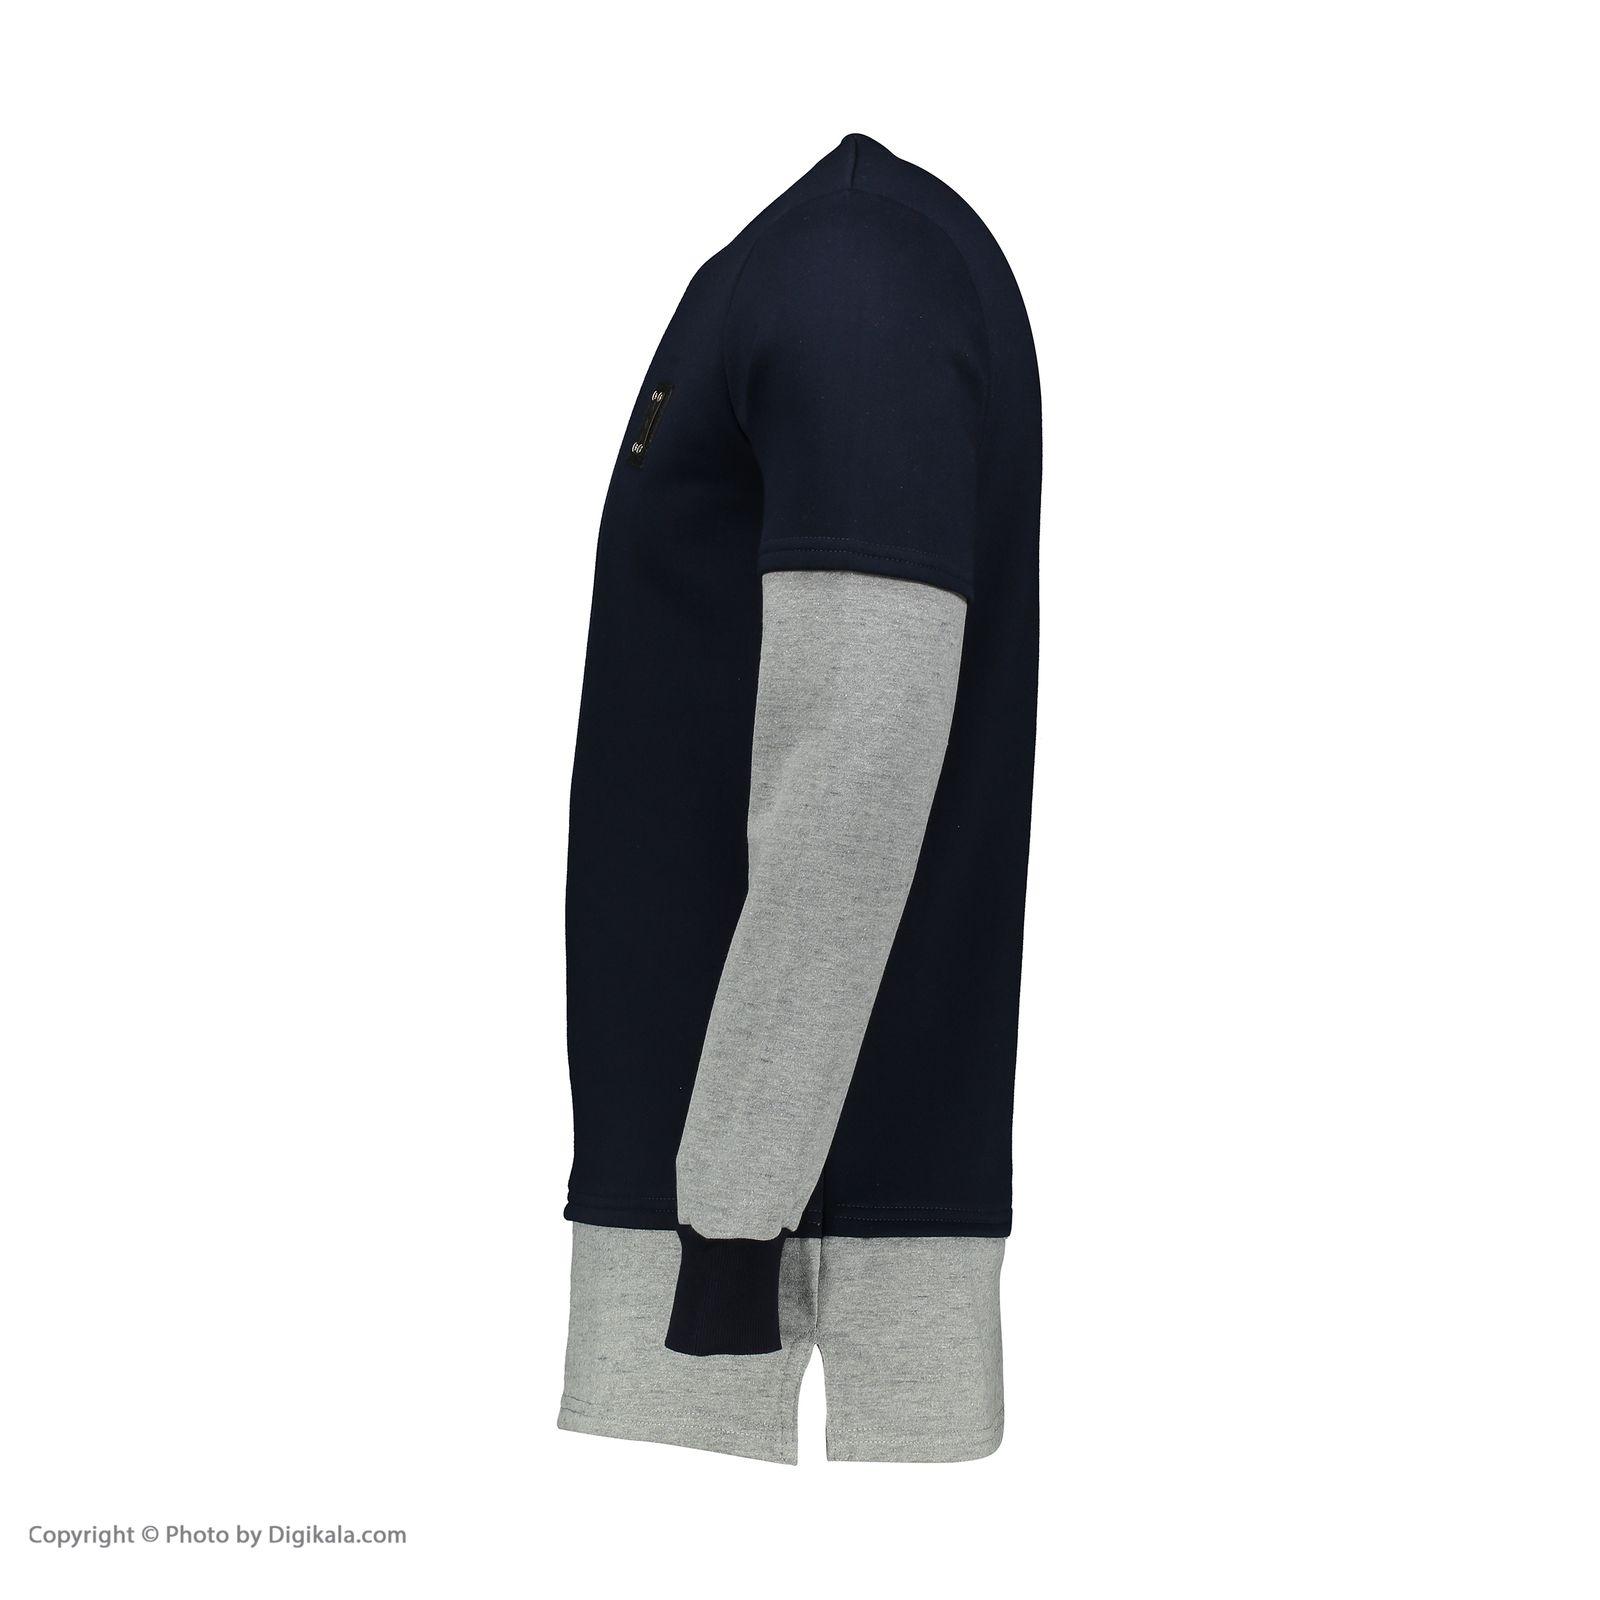 سوییشرت مردانه باینت کد 600-2 -  - 4